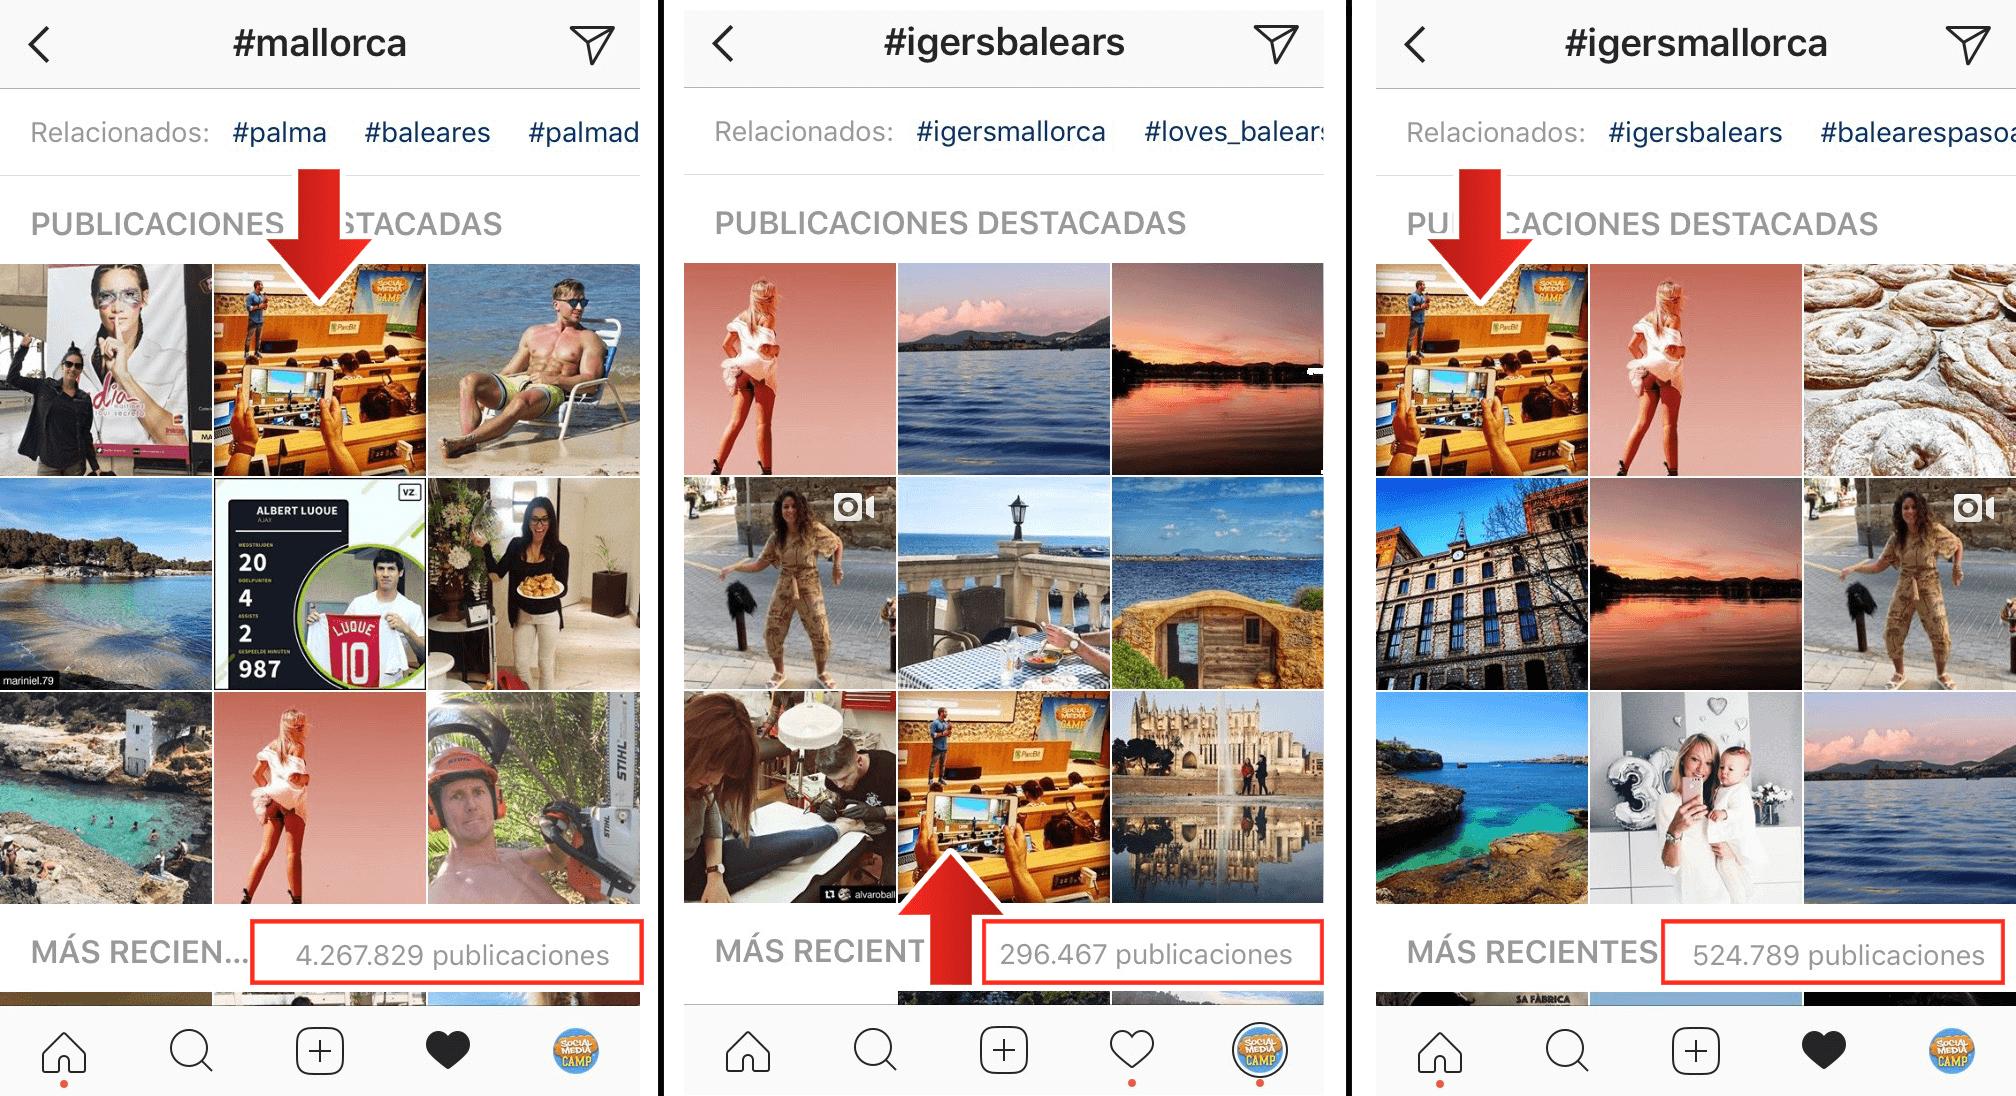 algoritmo instagram amel fernandez 2